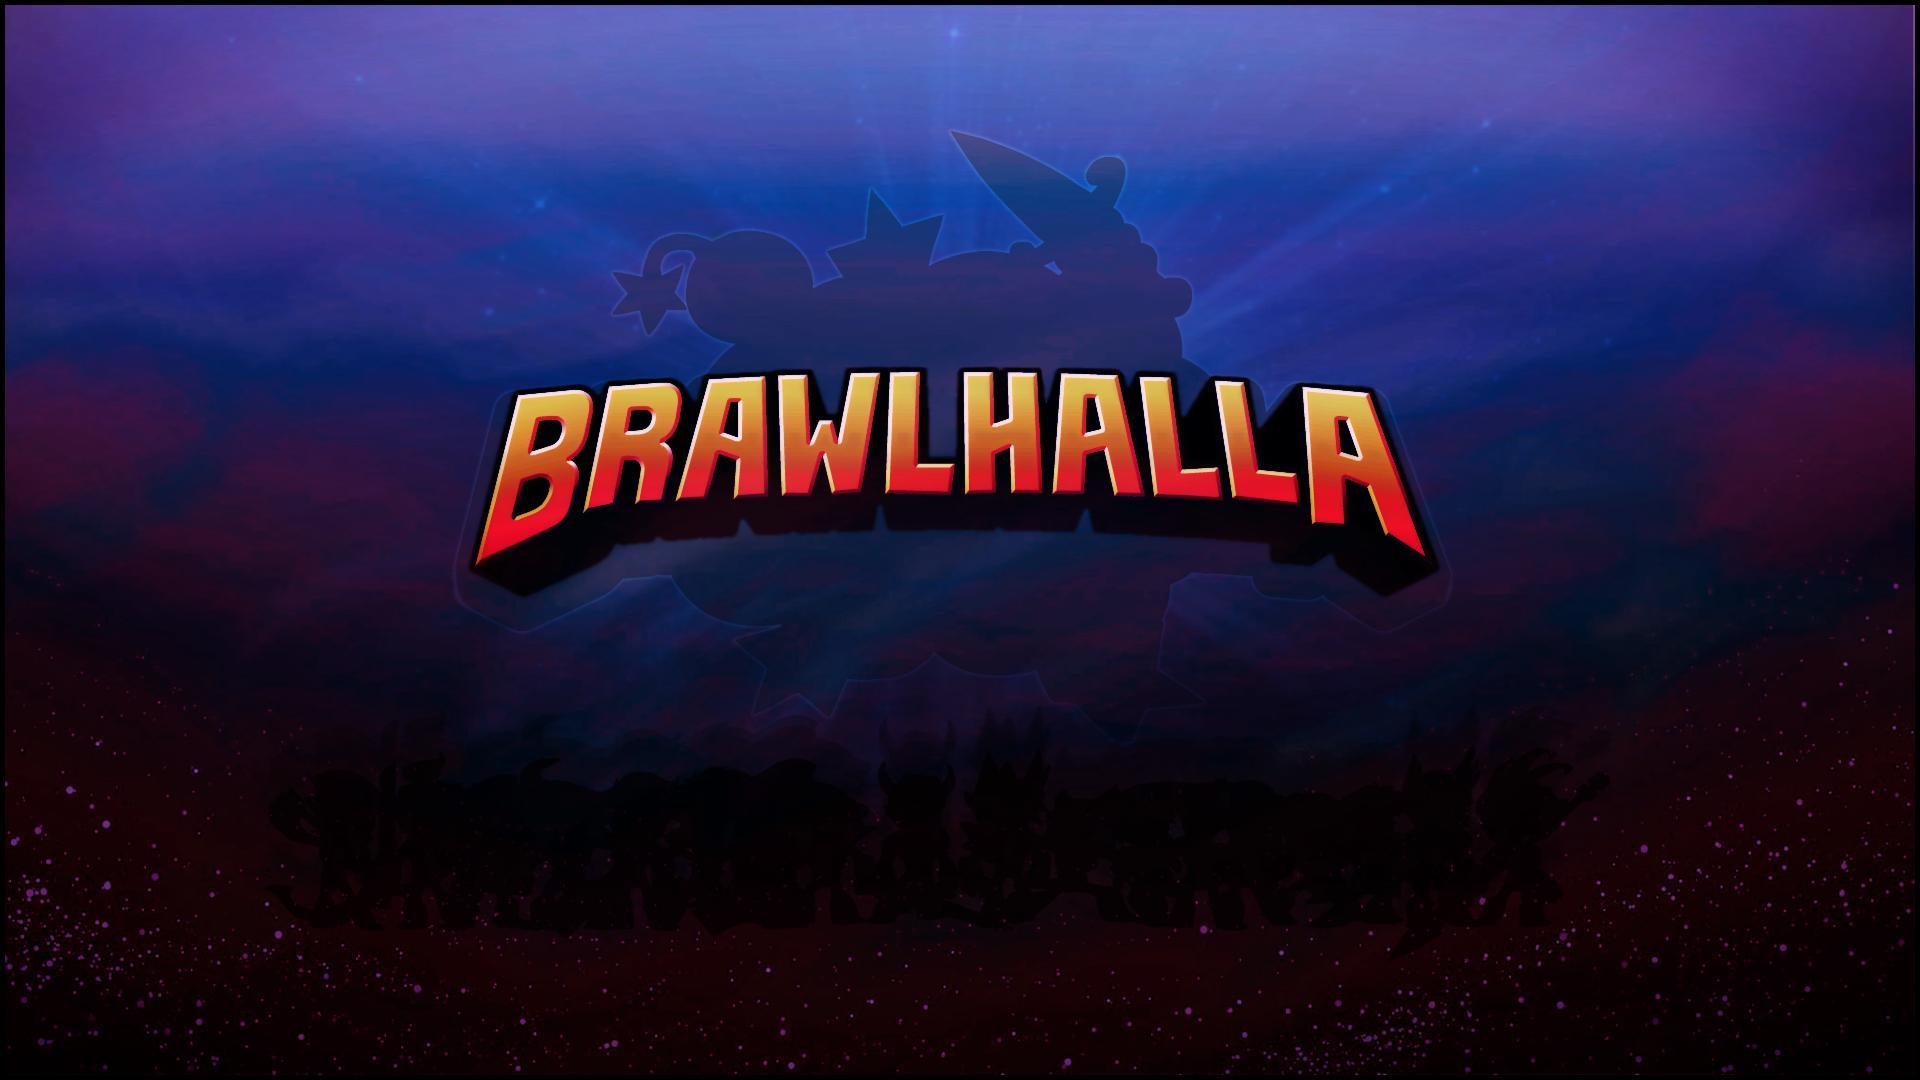 Brawlhalla PS4 Closed Beta Starting Soon